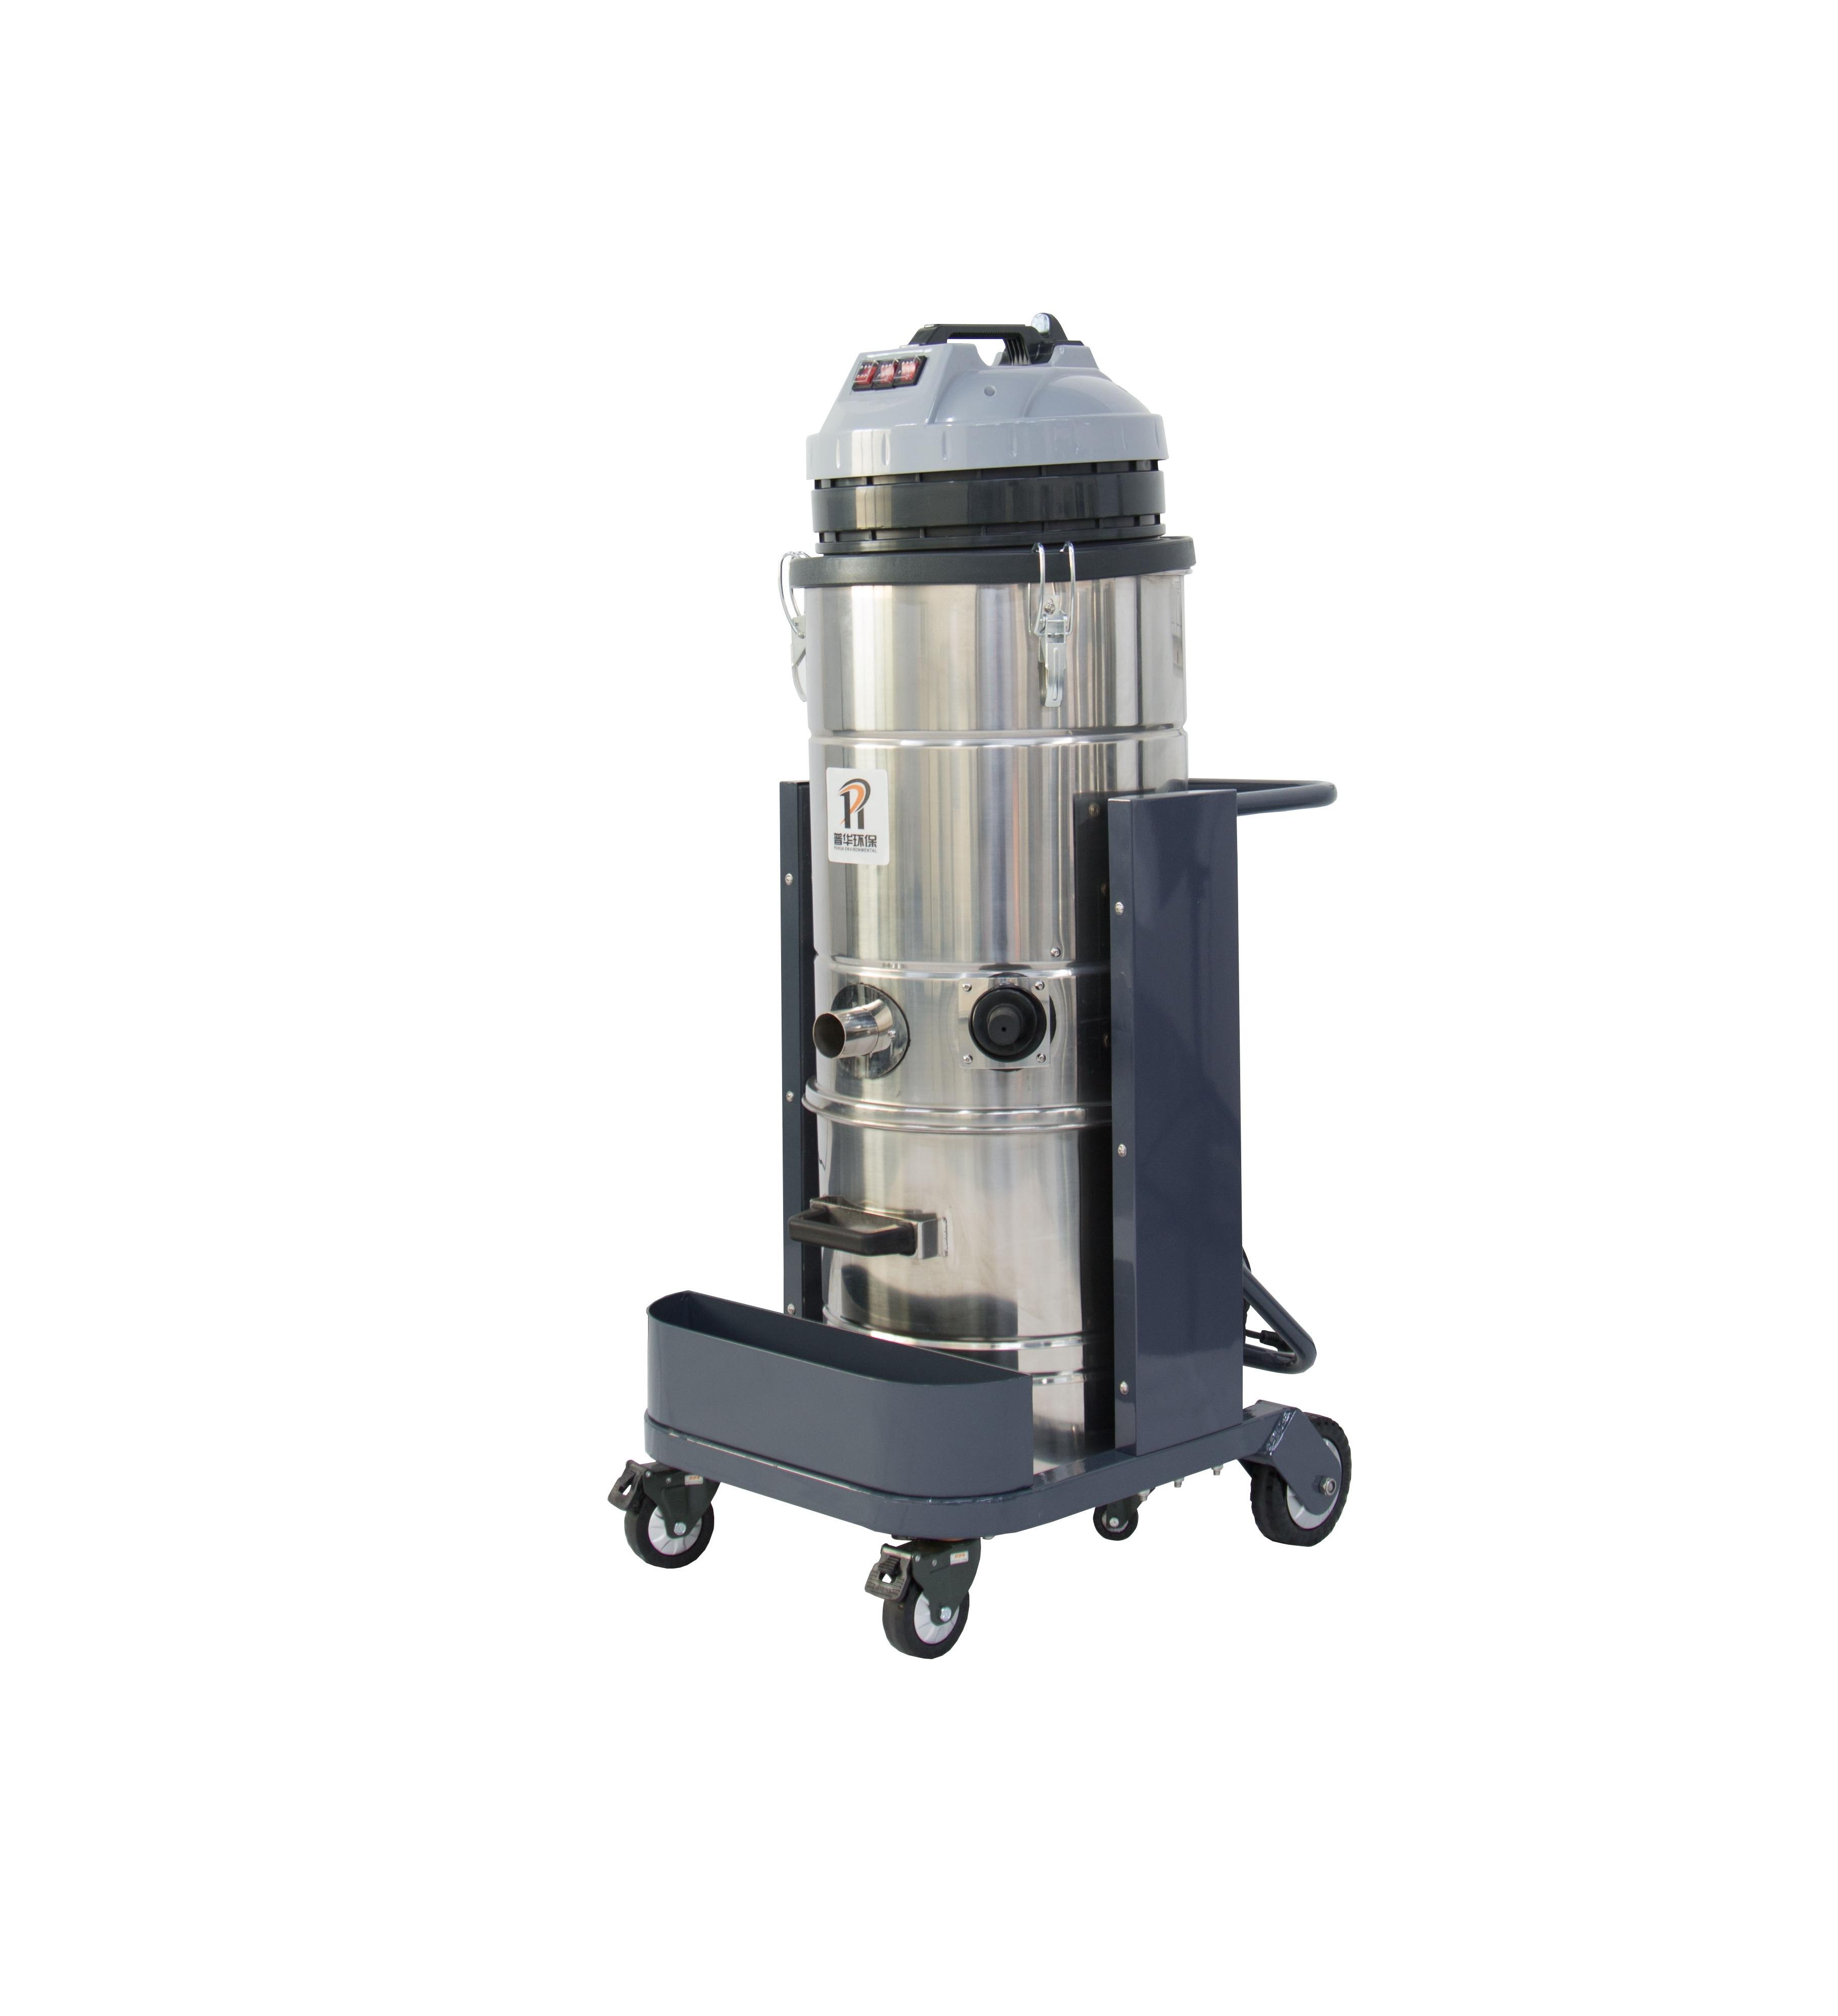 P3J单相经济型工业吸尘器